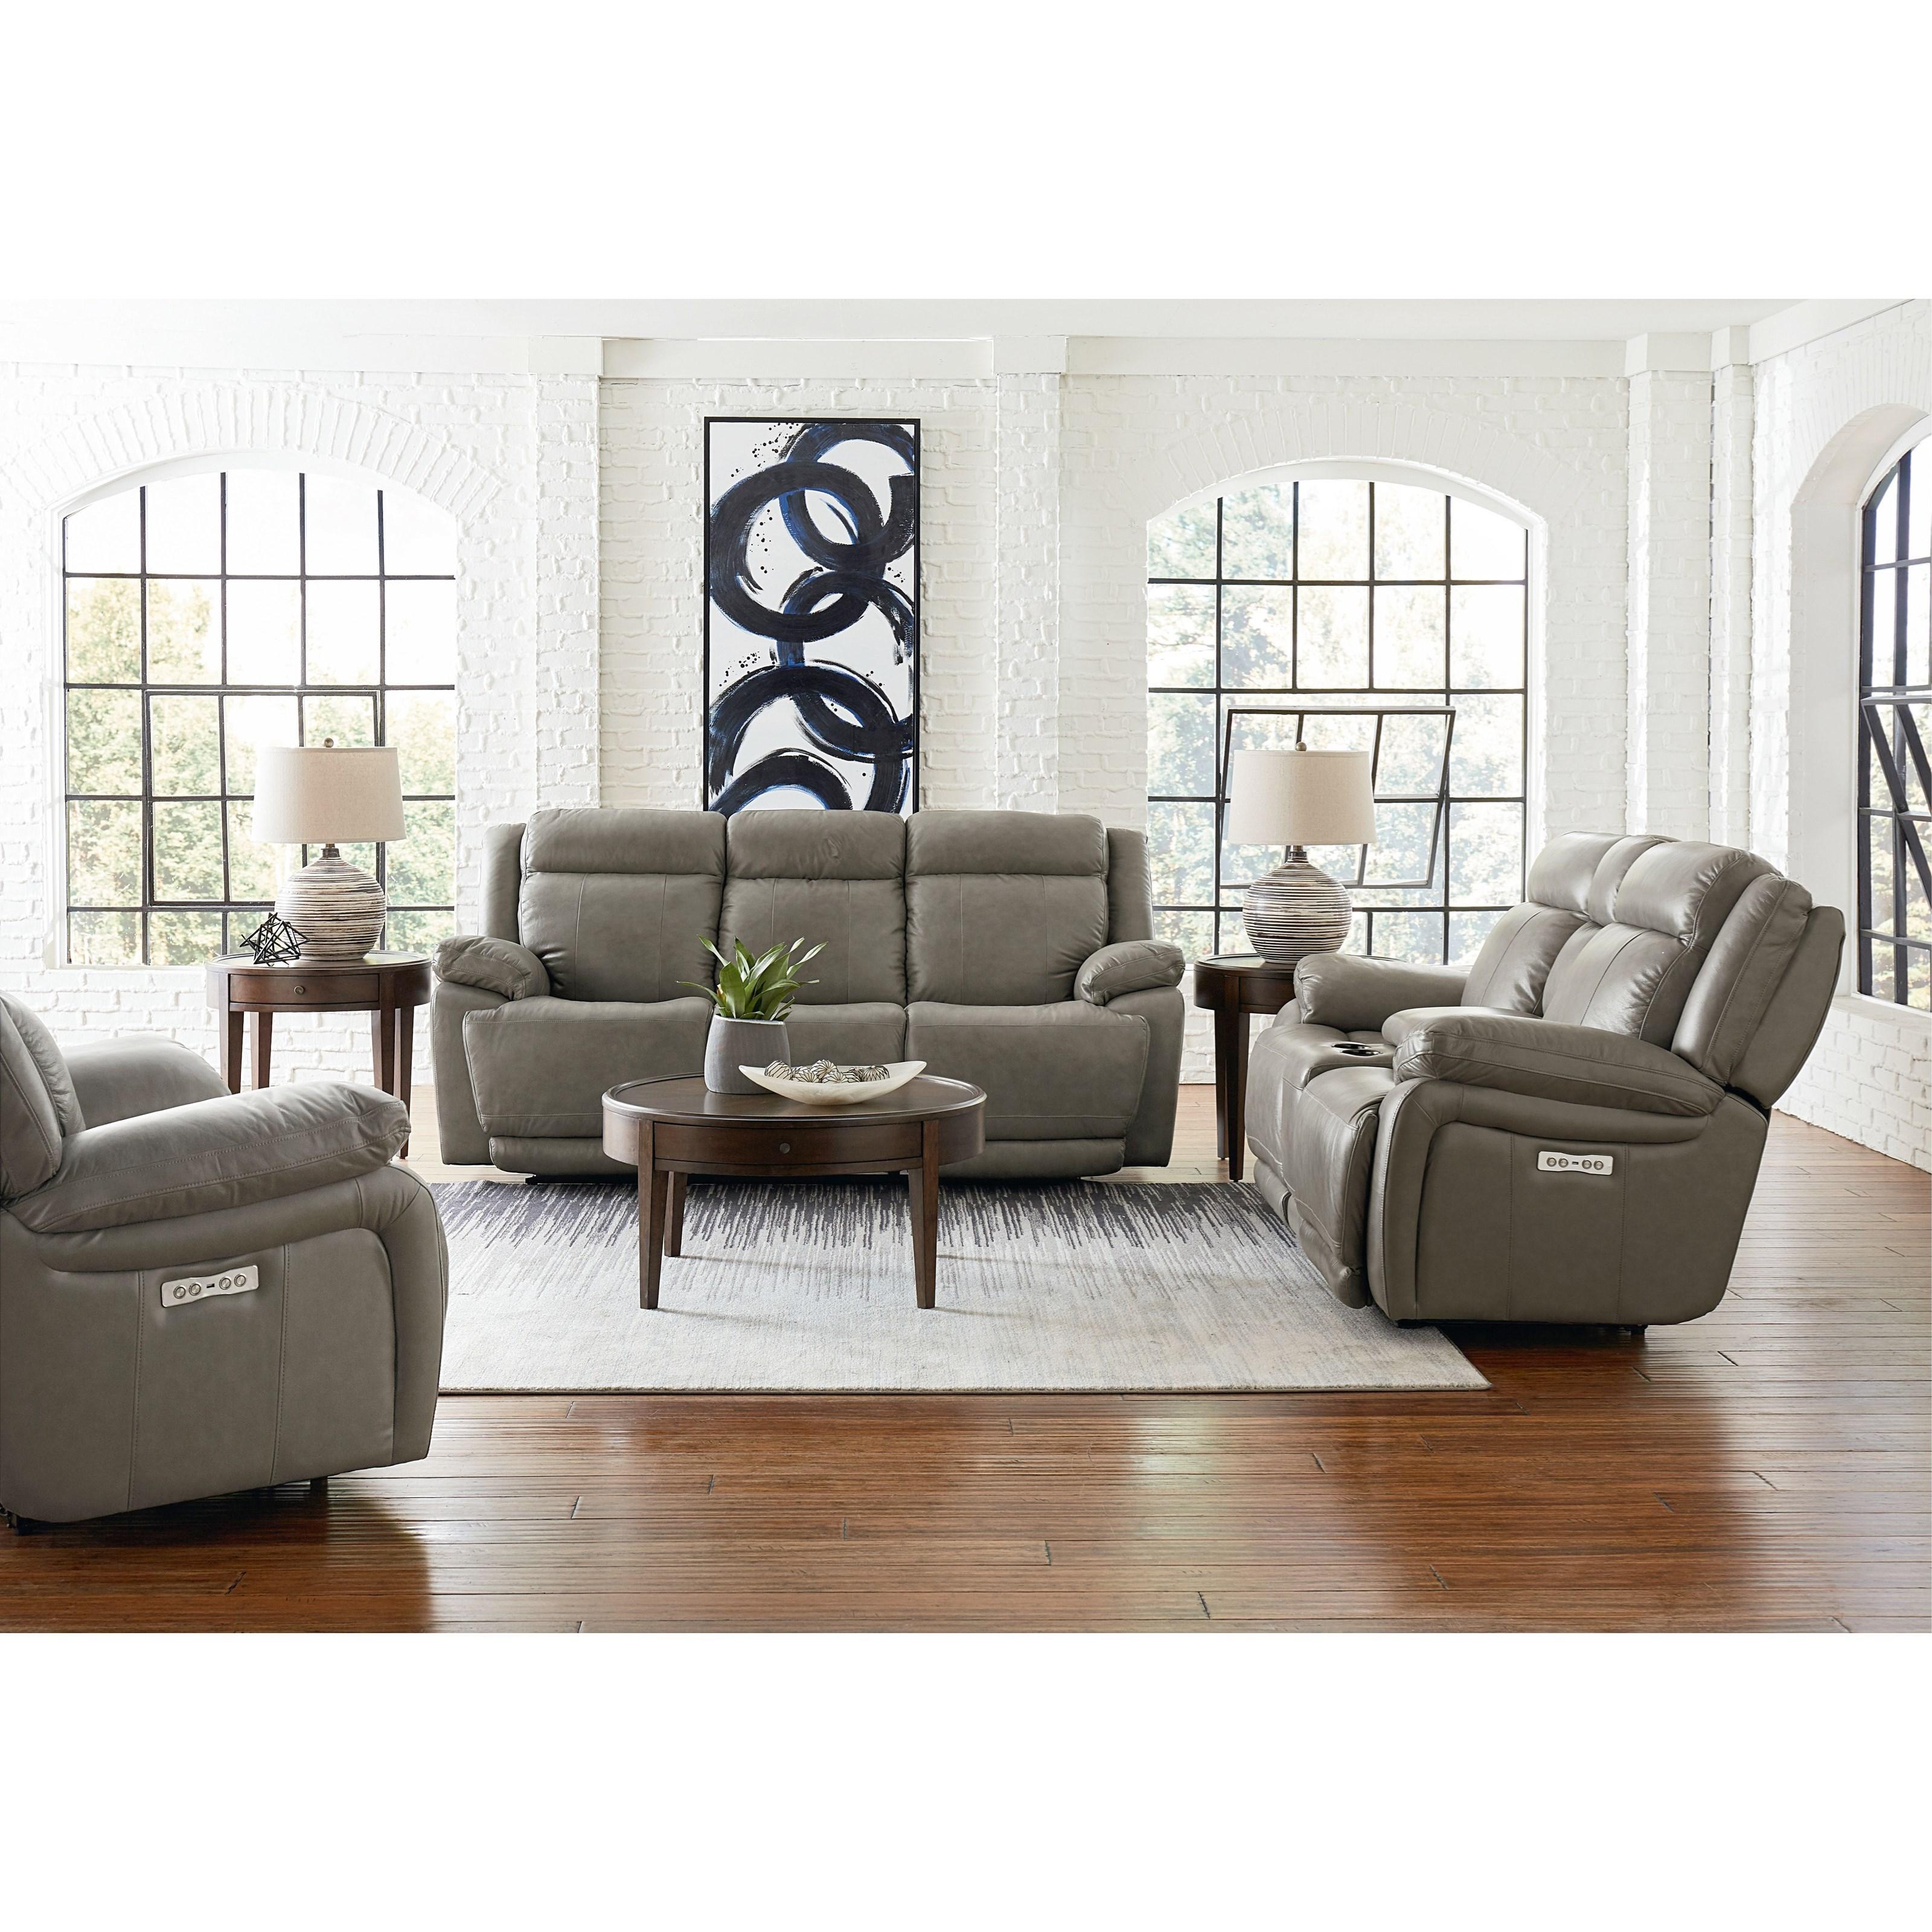 Evo Reclining Living Room Group by Bassett at Bassett of Cool Springs